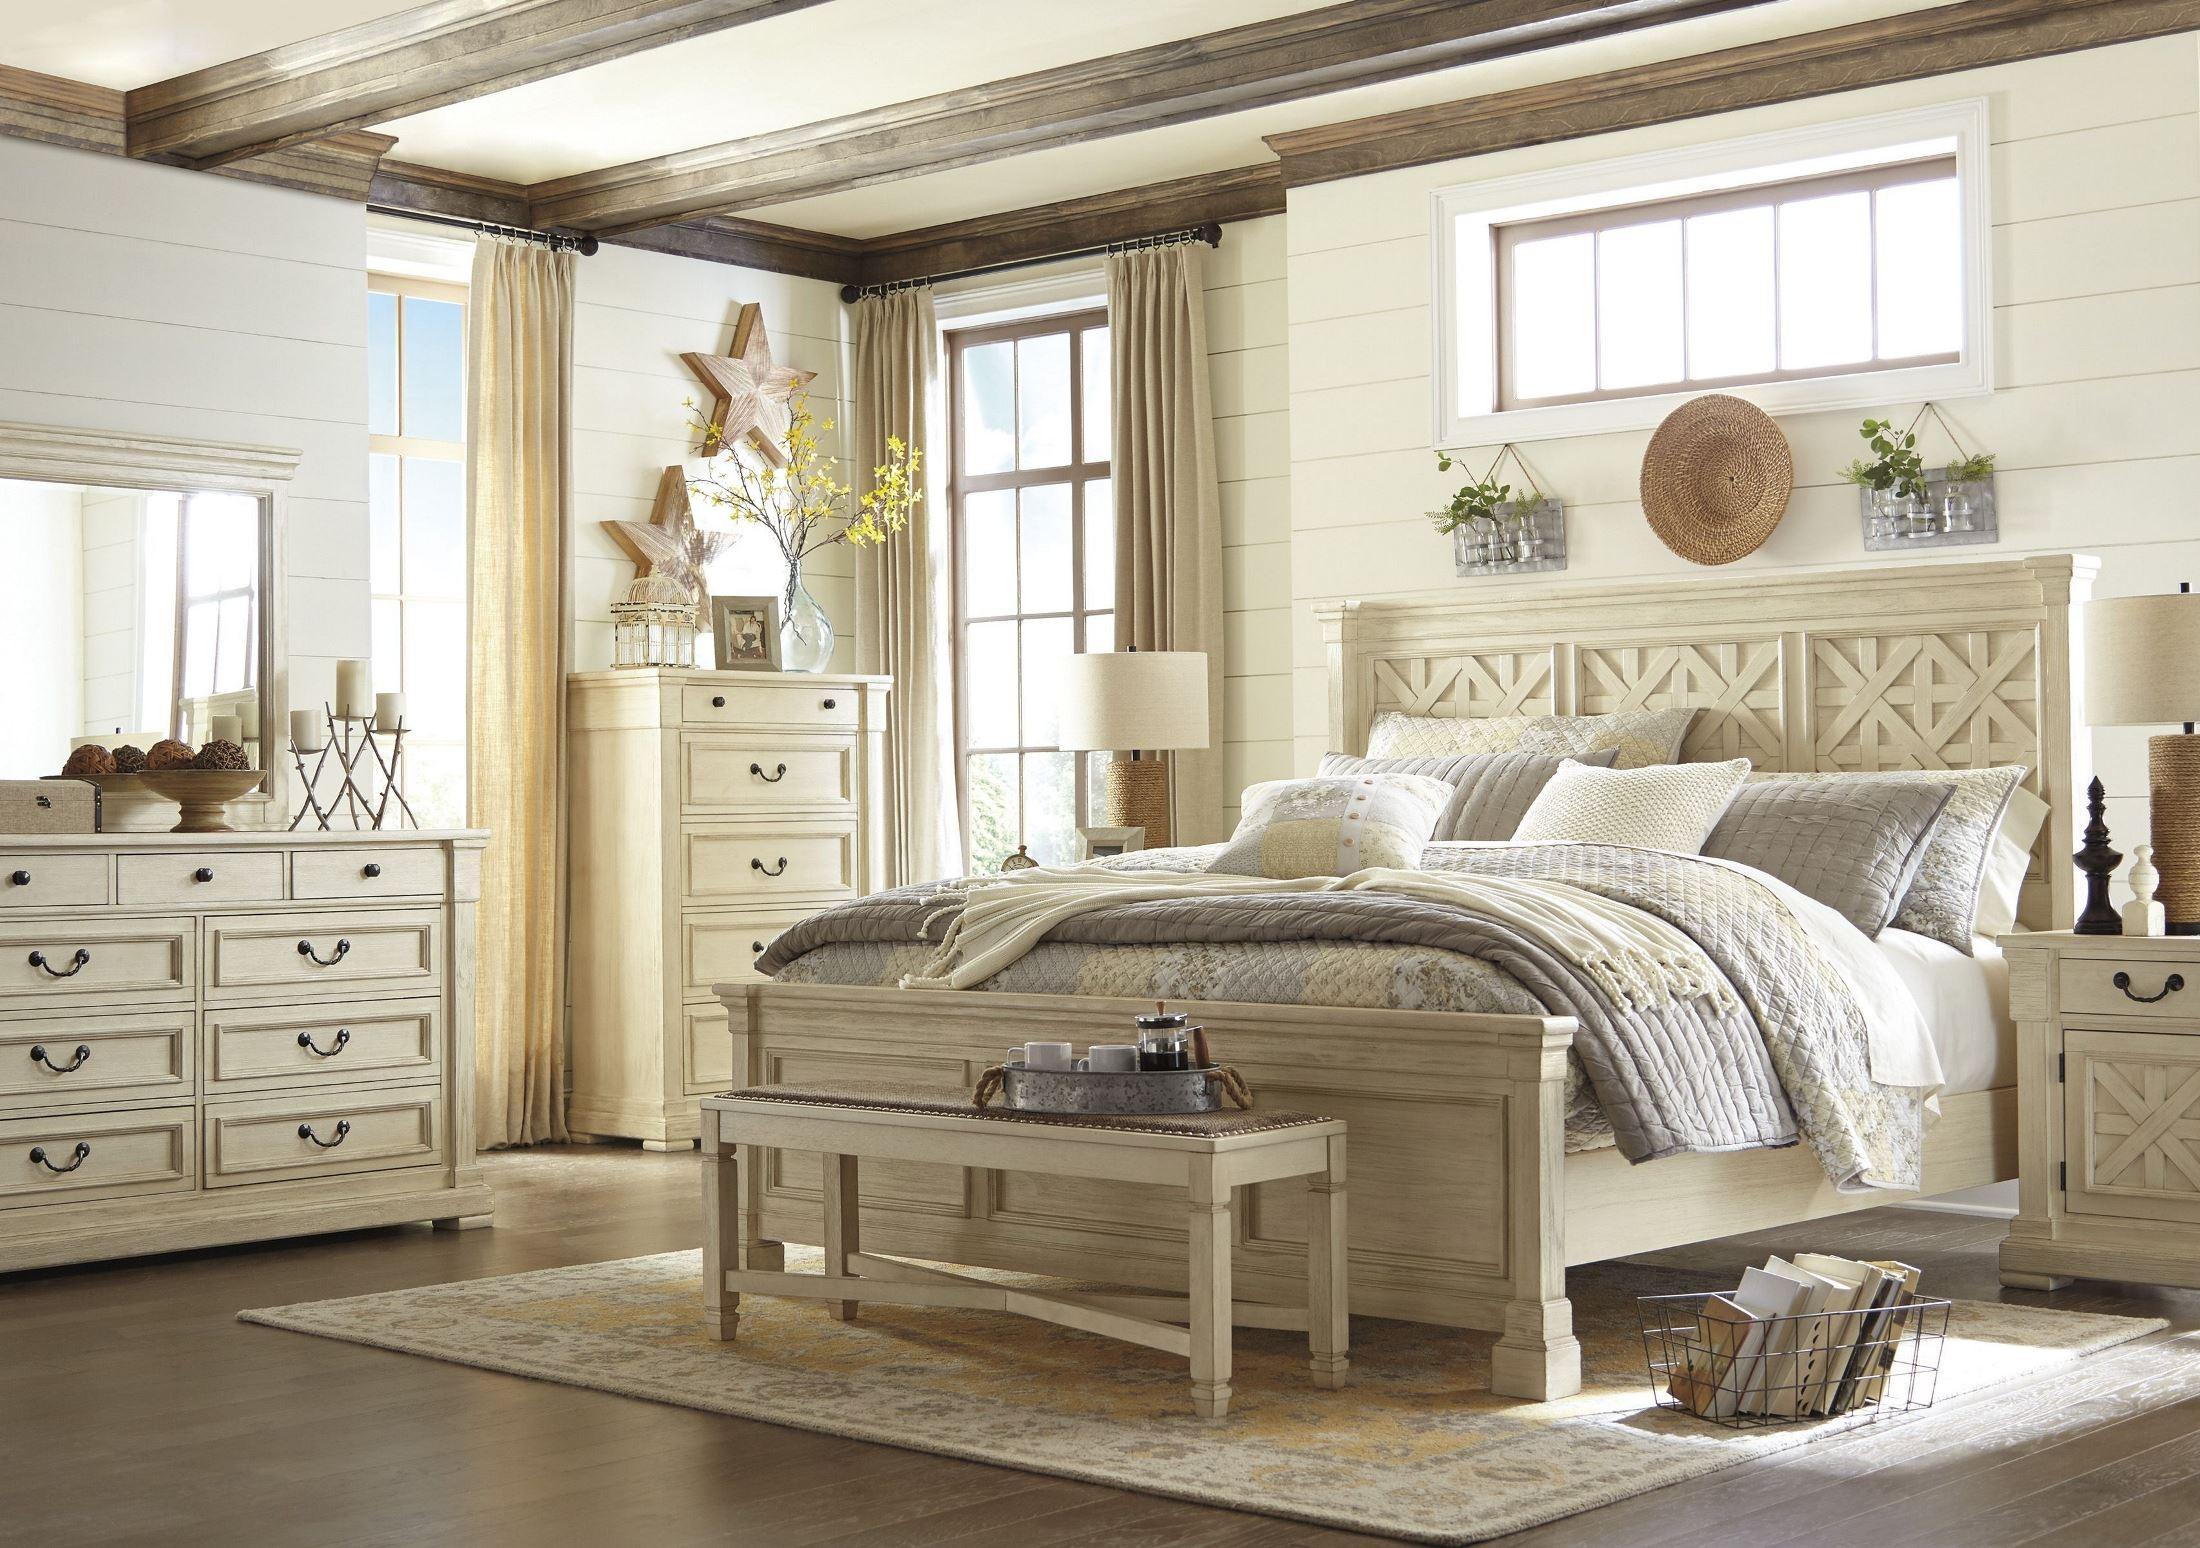 Bolanburg White Louvered Panel Bedroom Set B647 54 77 96 Ashley